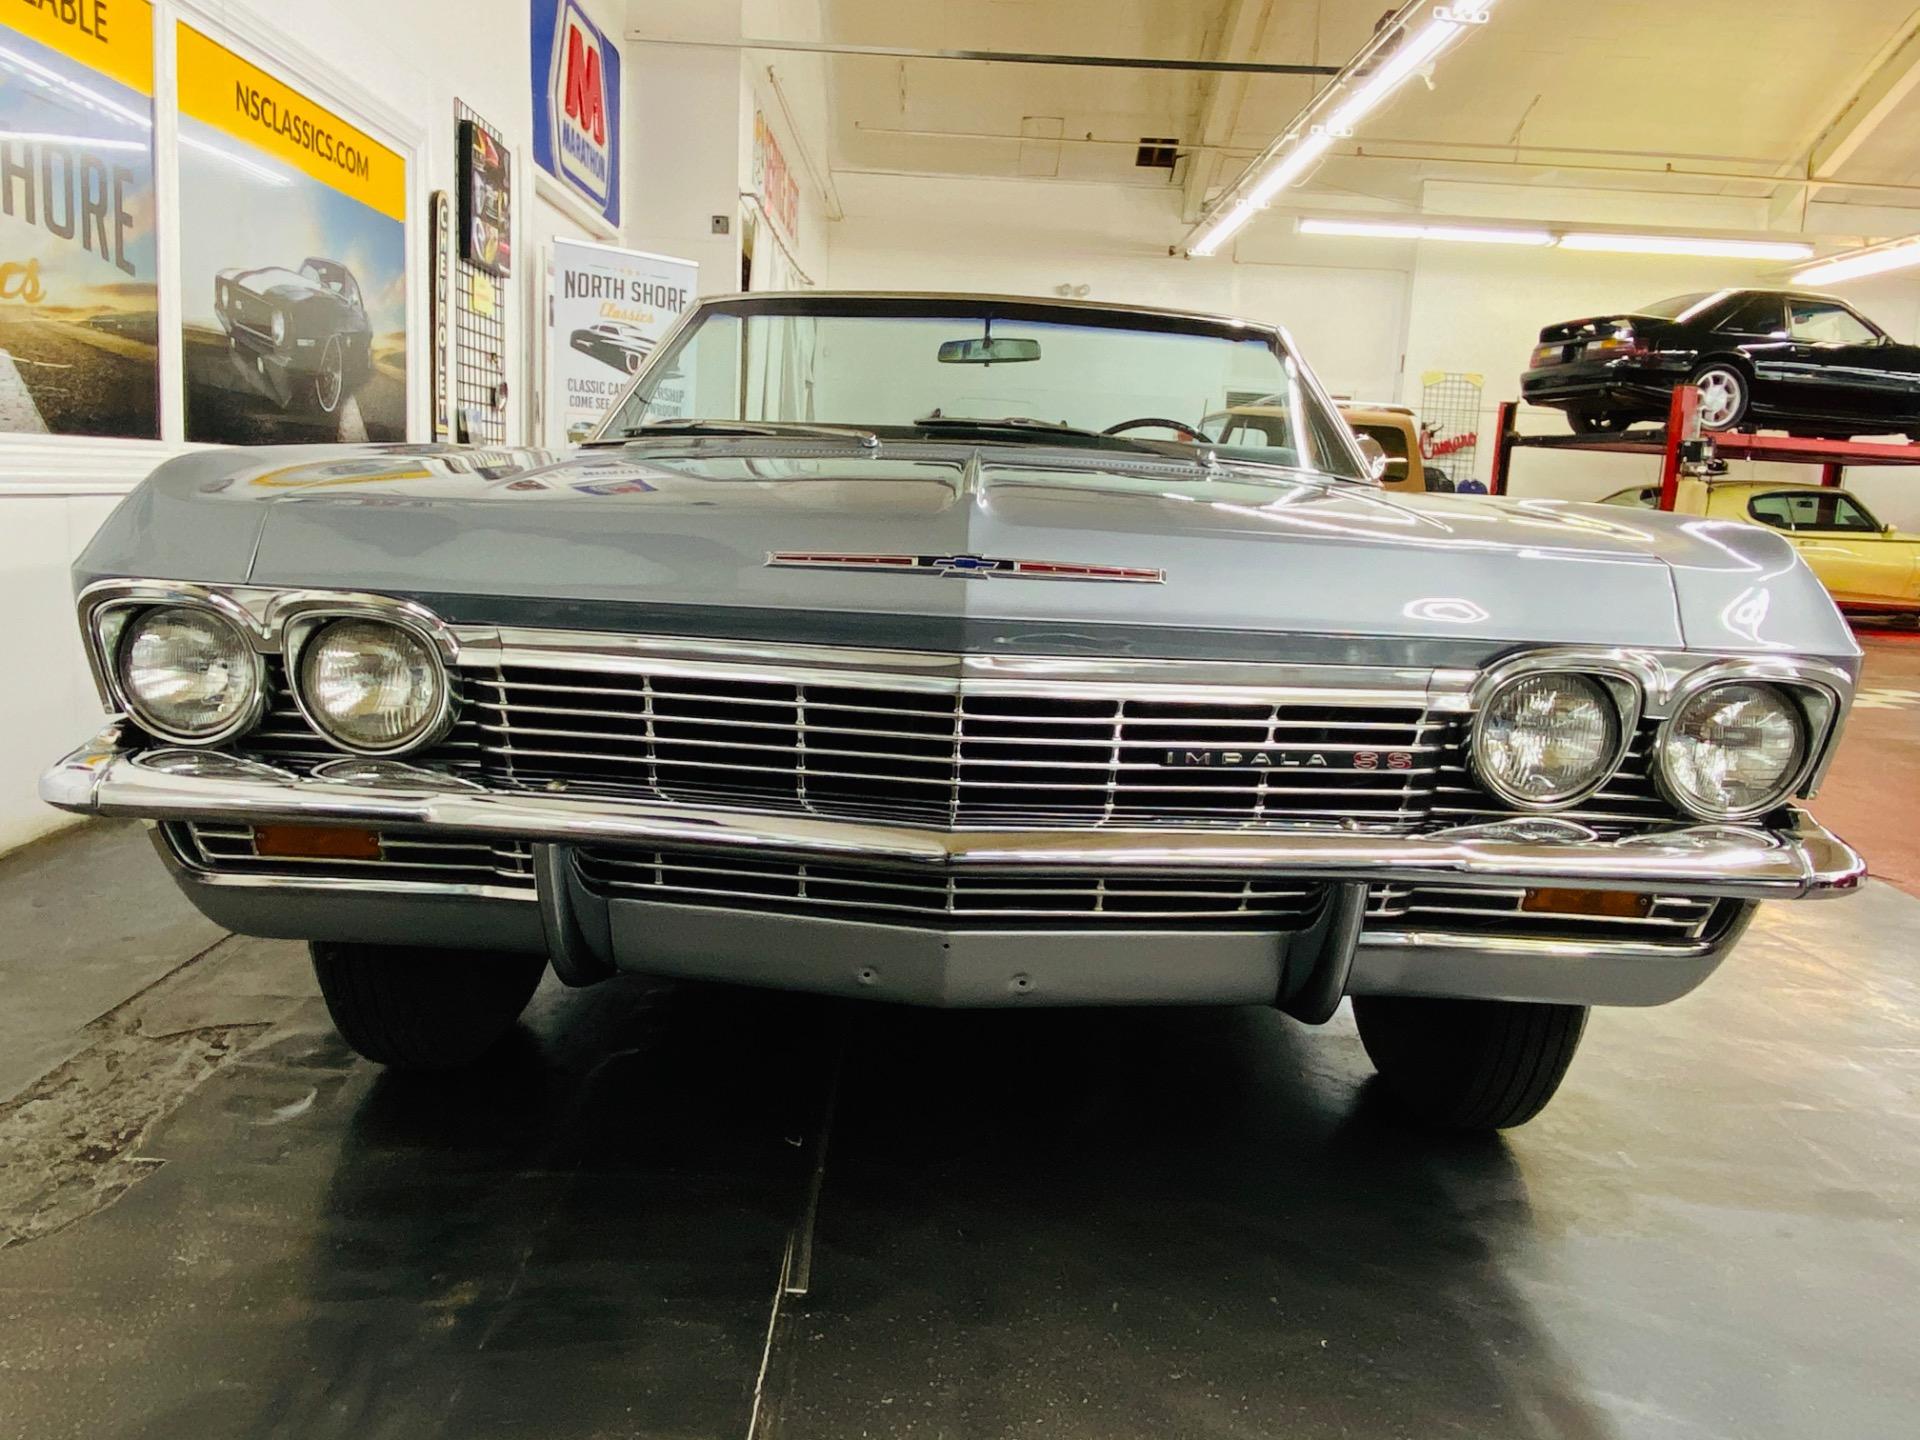 Used 1965 Chevrolet Impala -CONVERTIBLE - 425HP L78 396 - COPO - PROTECT-O-PLATE - | Mundelein, IL